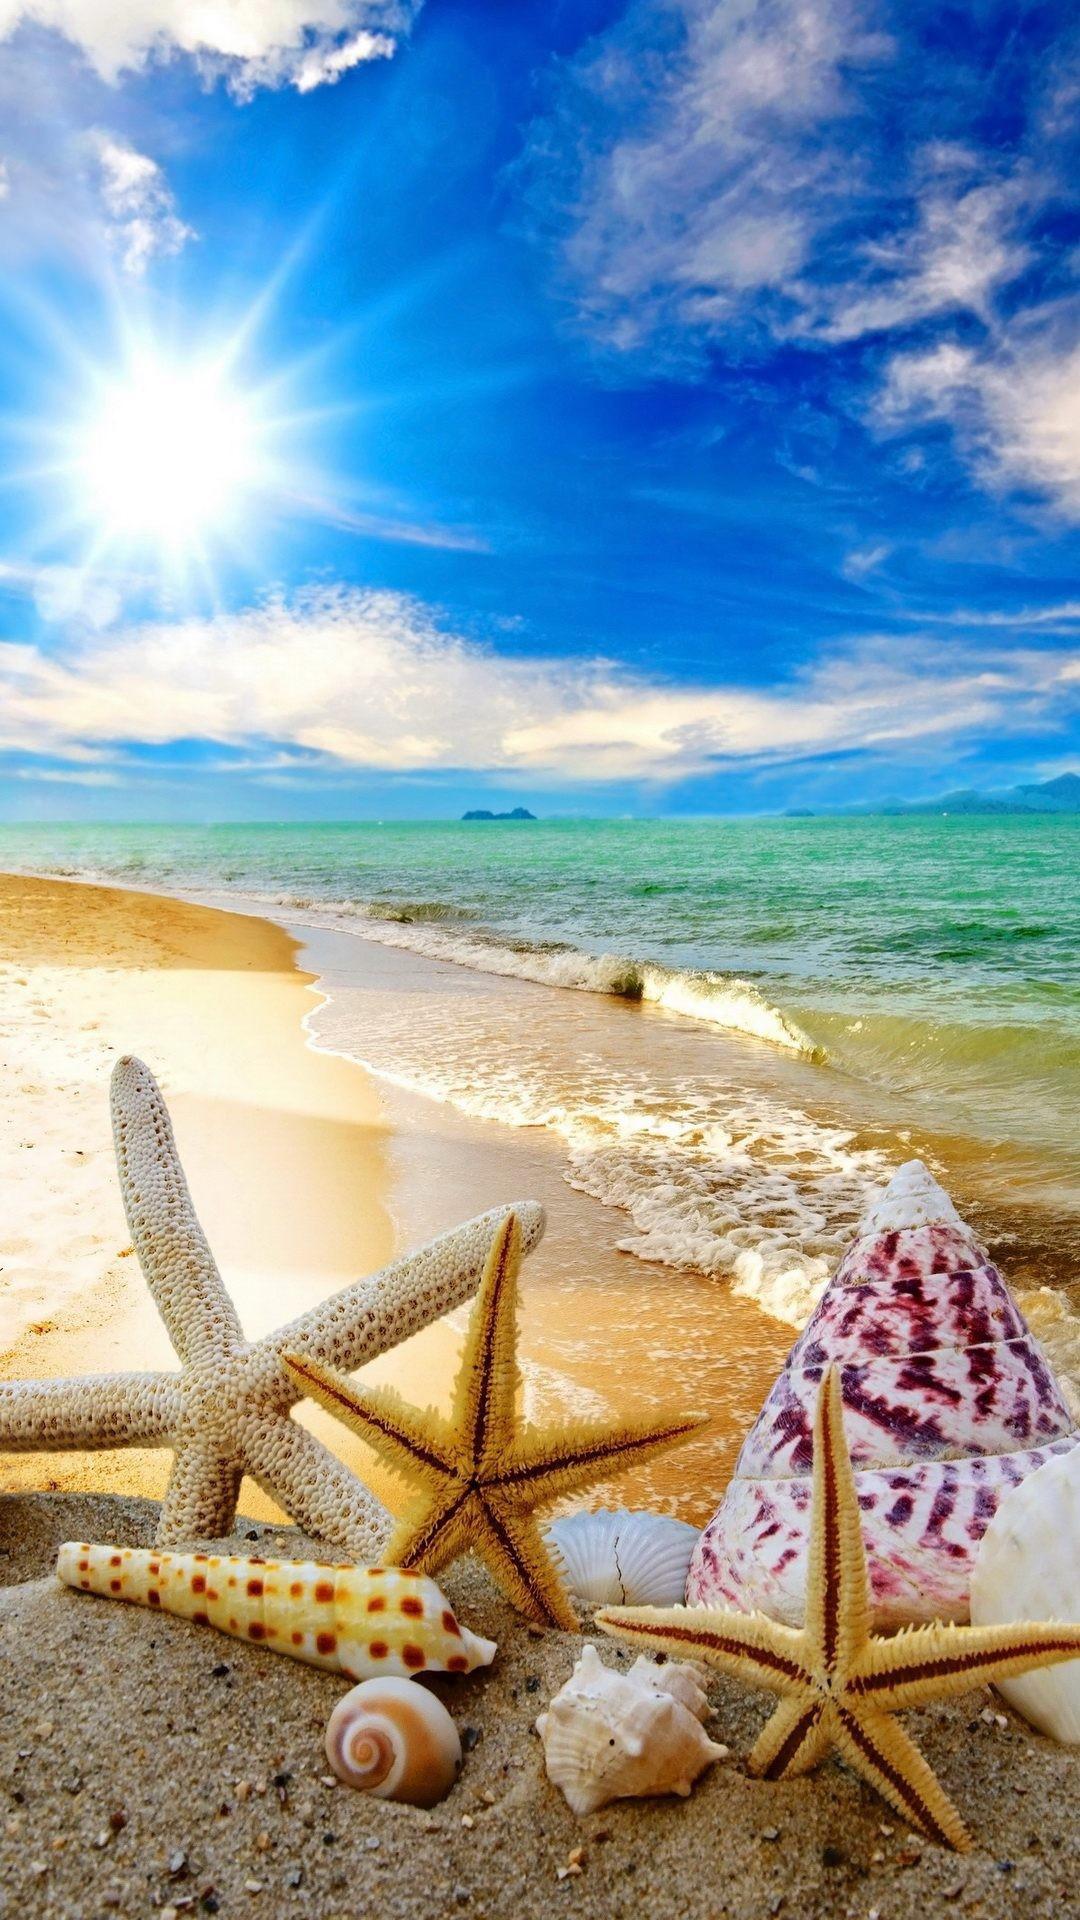 Summer Beach Sun Starfish Waves android wallpaper HD